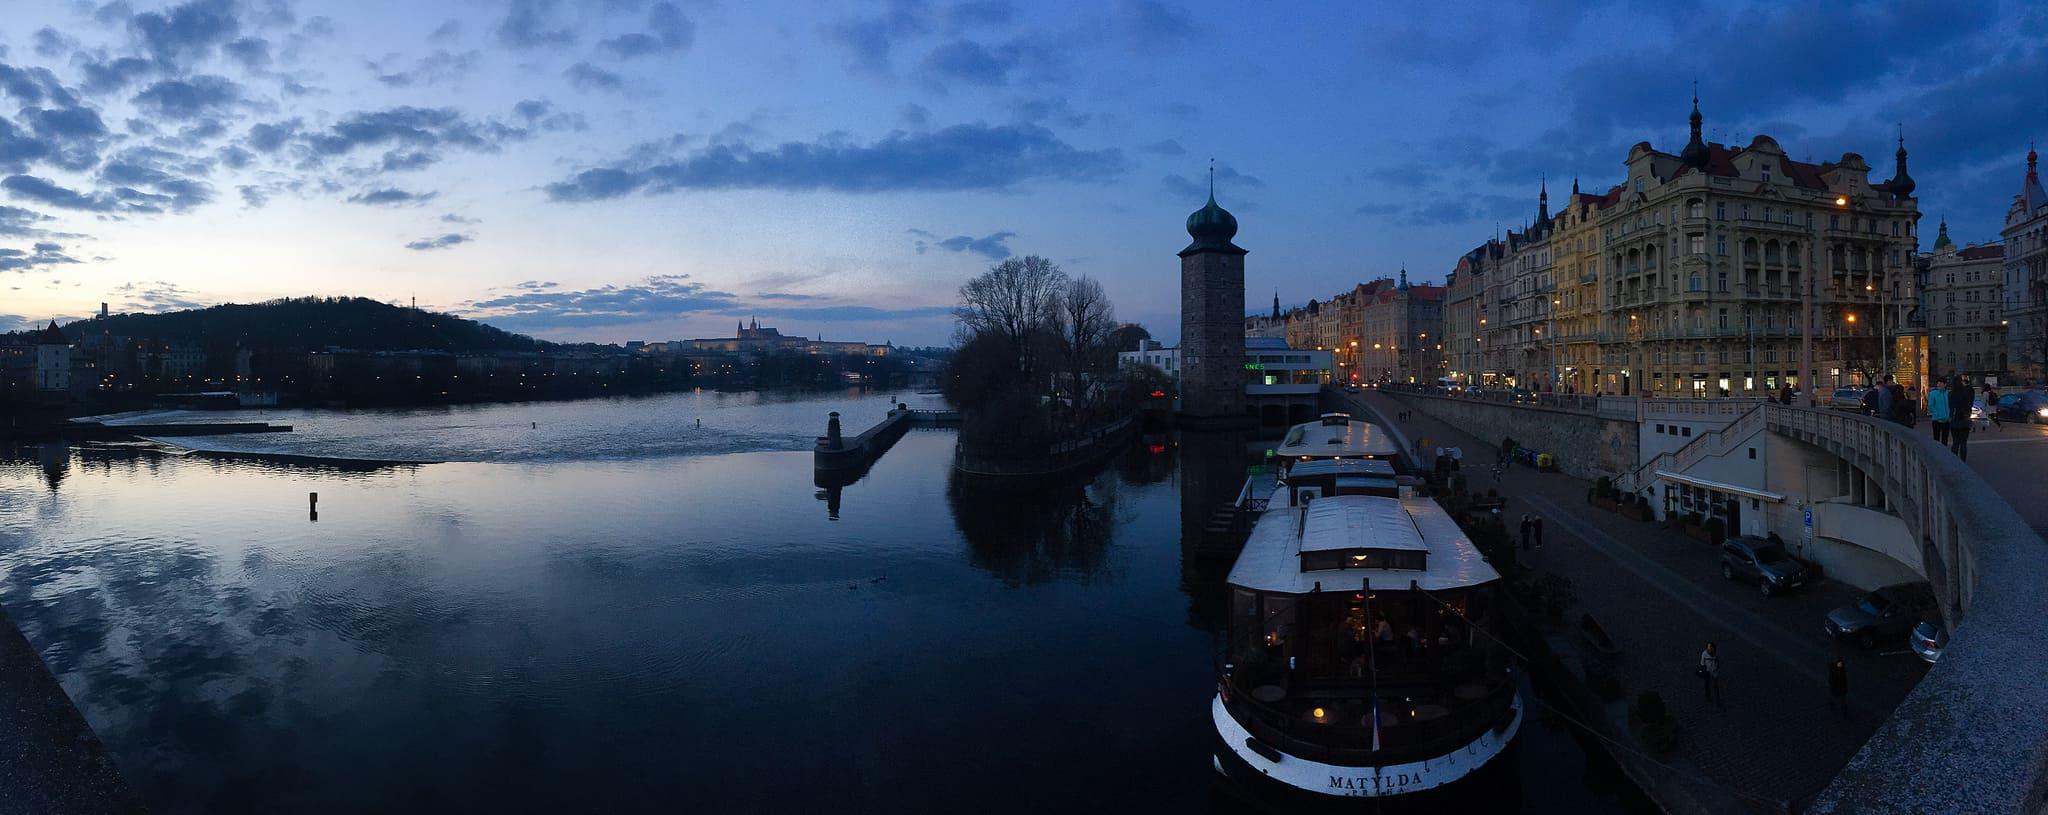 Quartiere vecchio di Praga